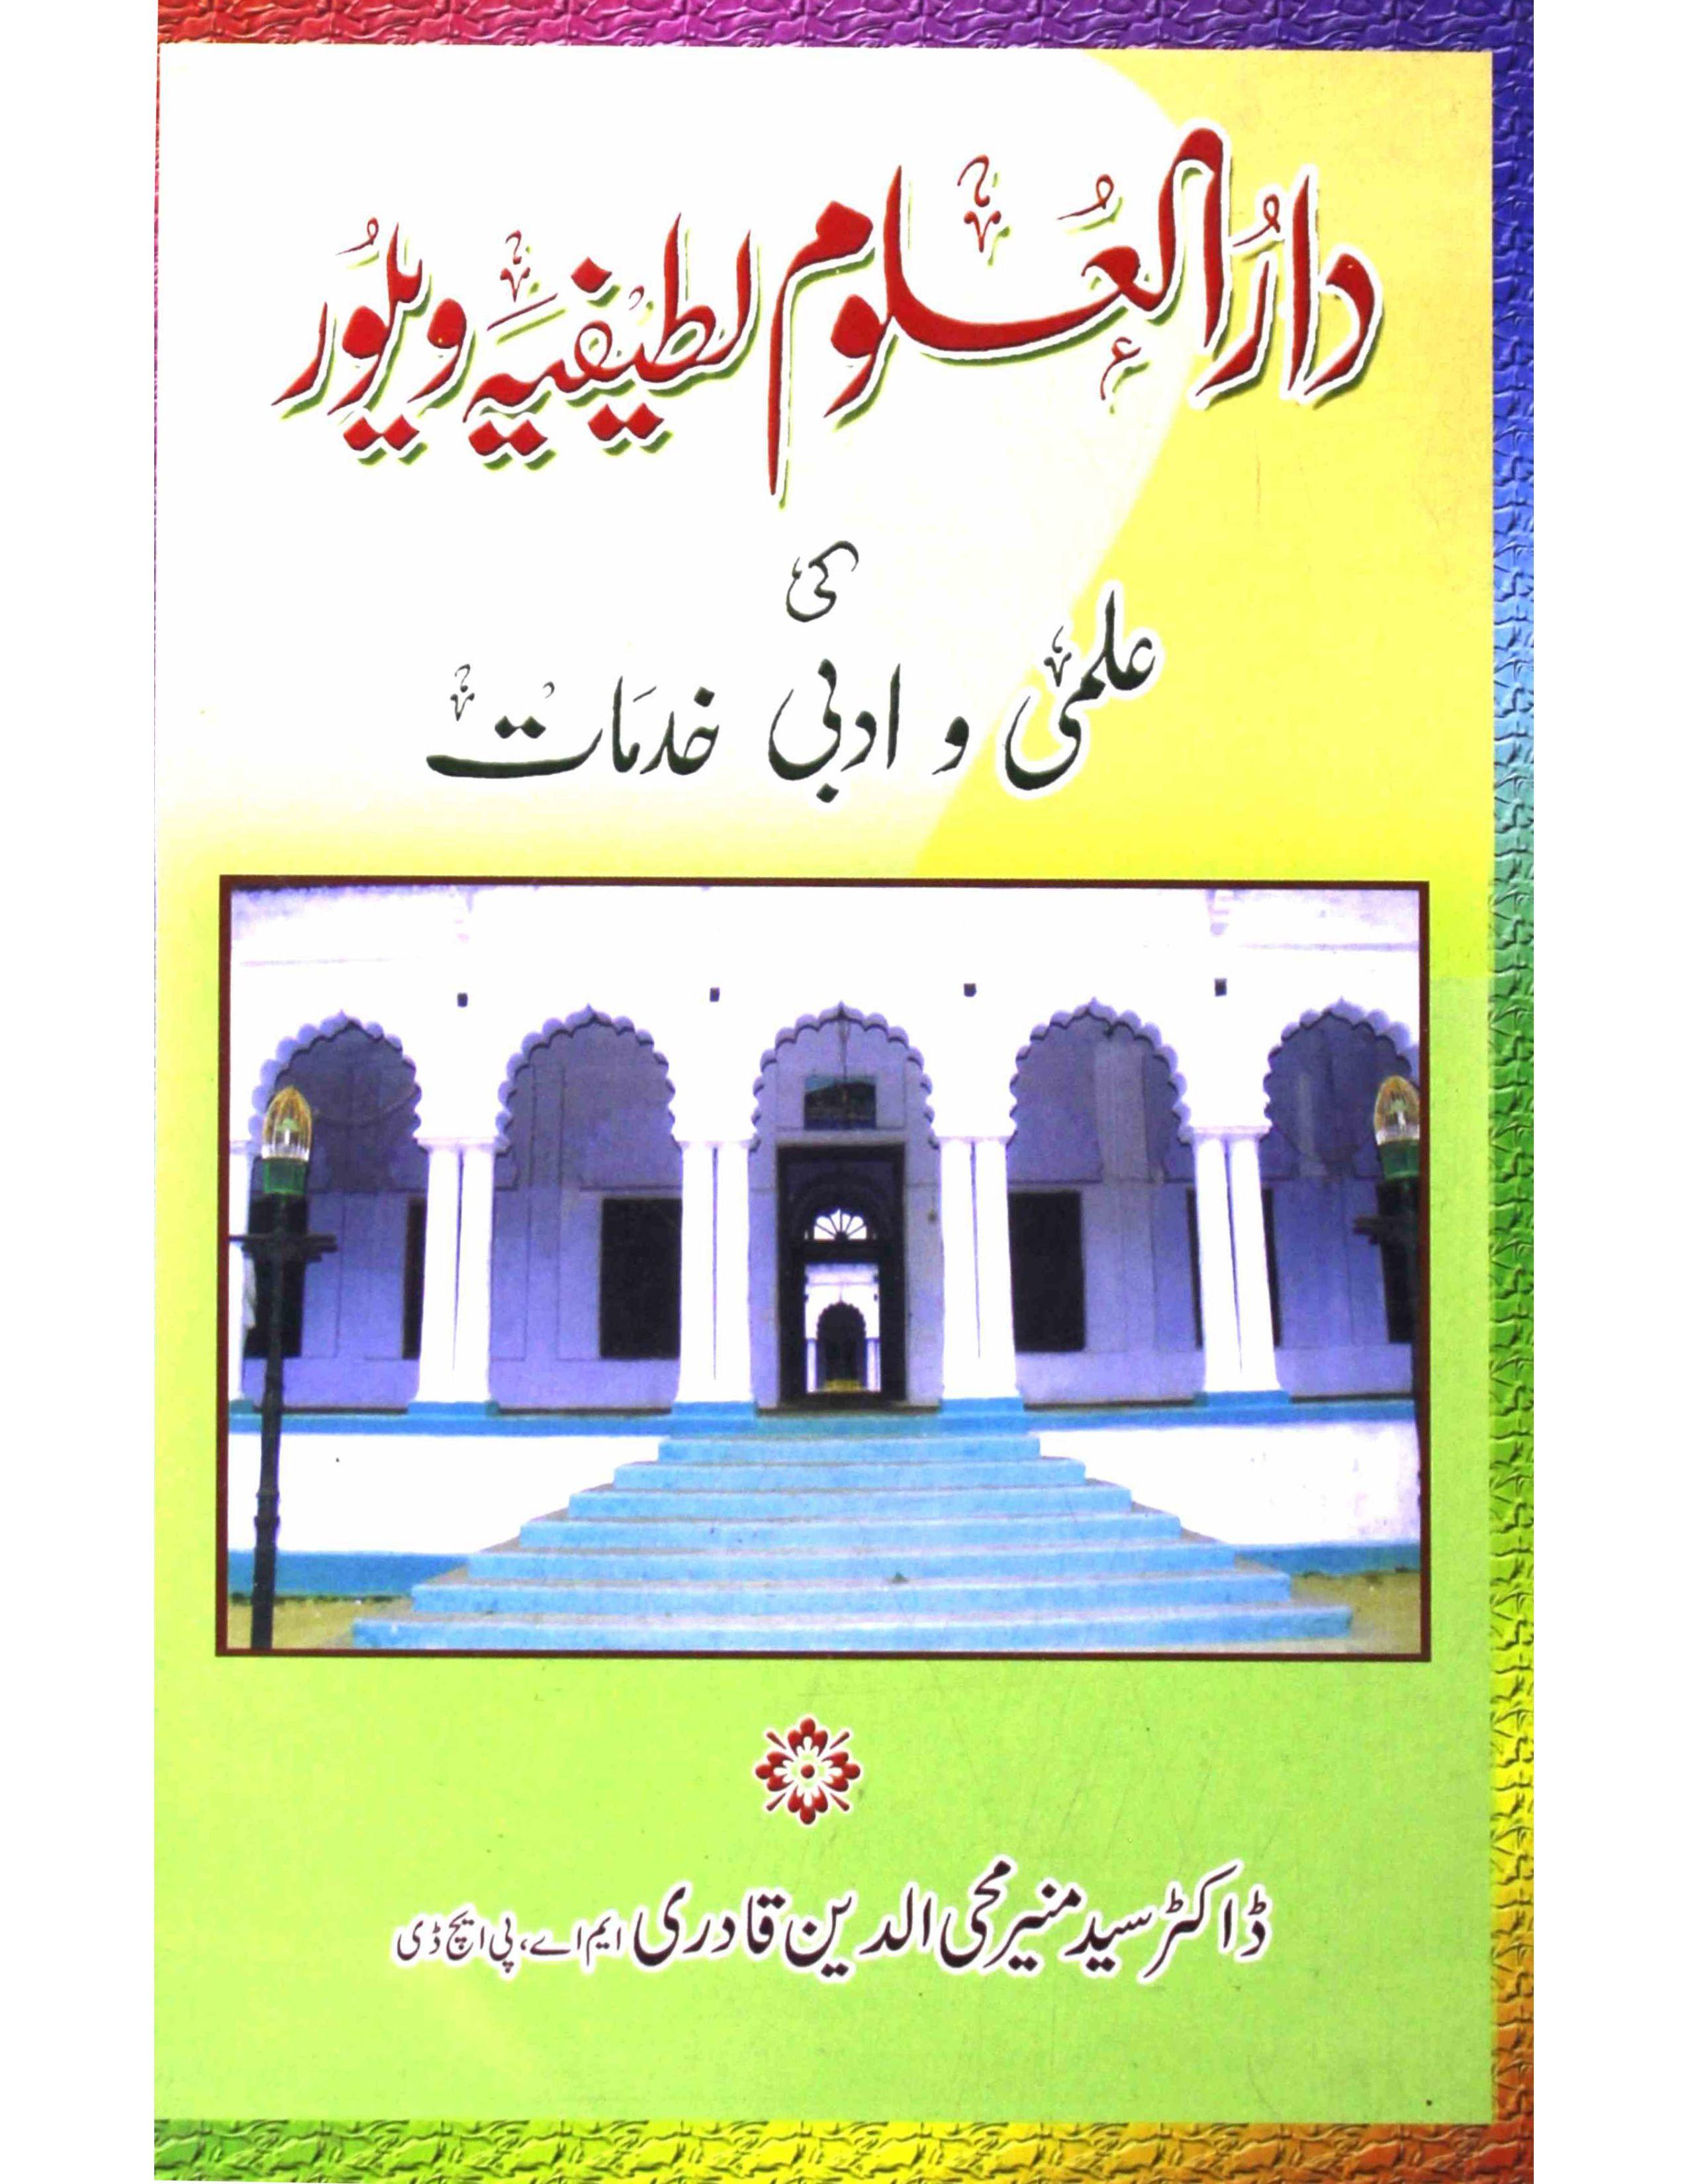 Darul Uloom Latifiya Ki Ilmi-o-Adabi Khidmat